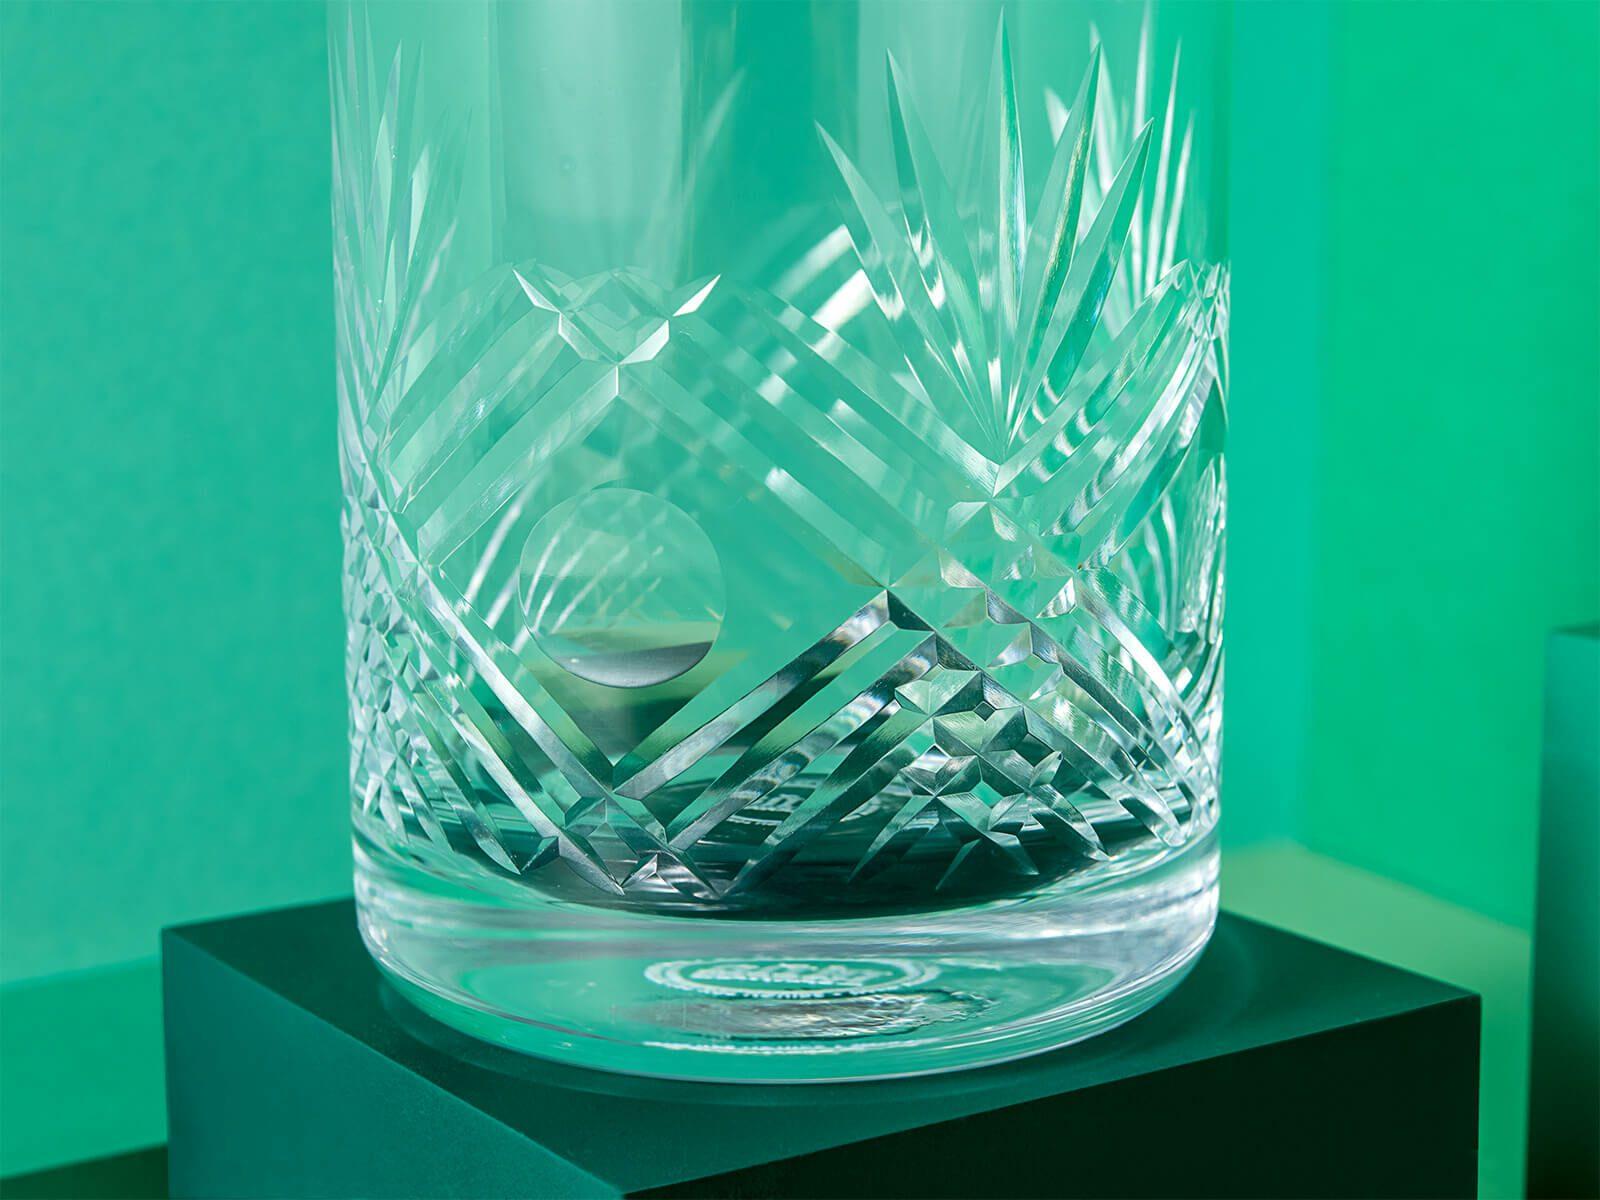 Mixing Glass Pina Rührglas Cocktail Glass - Drink Syndikat horizontal 4